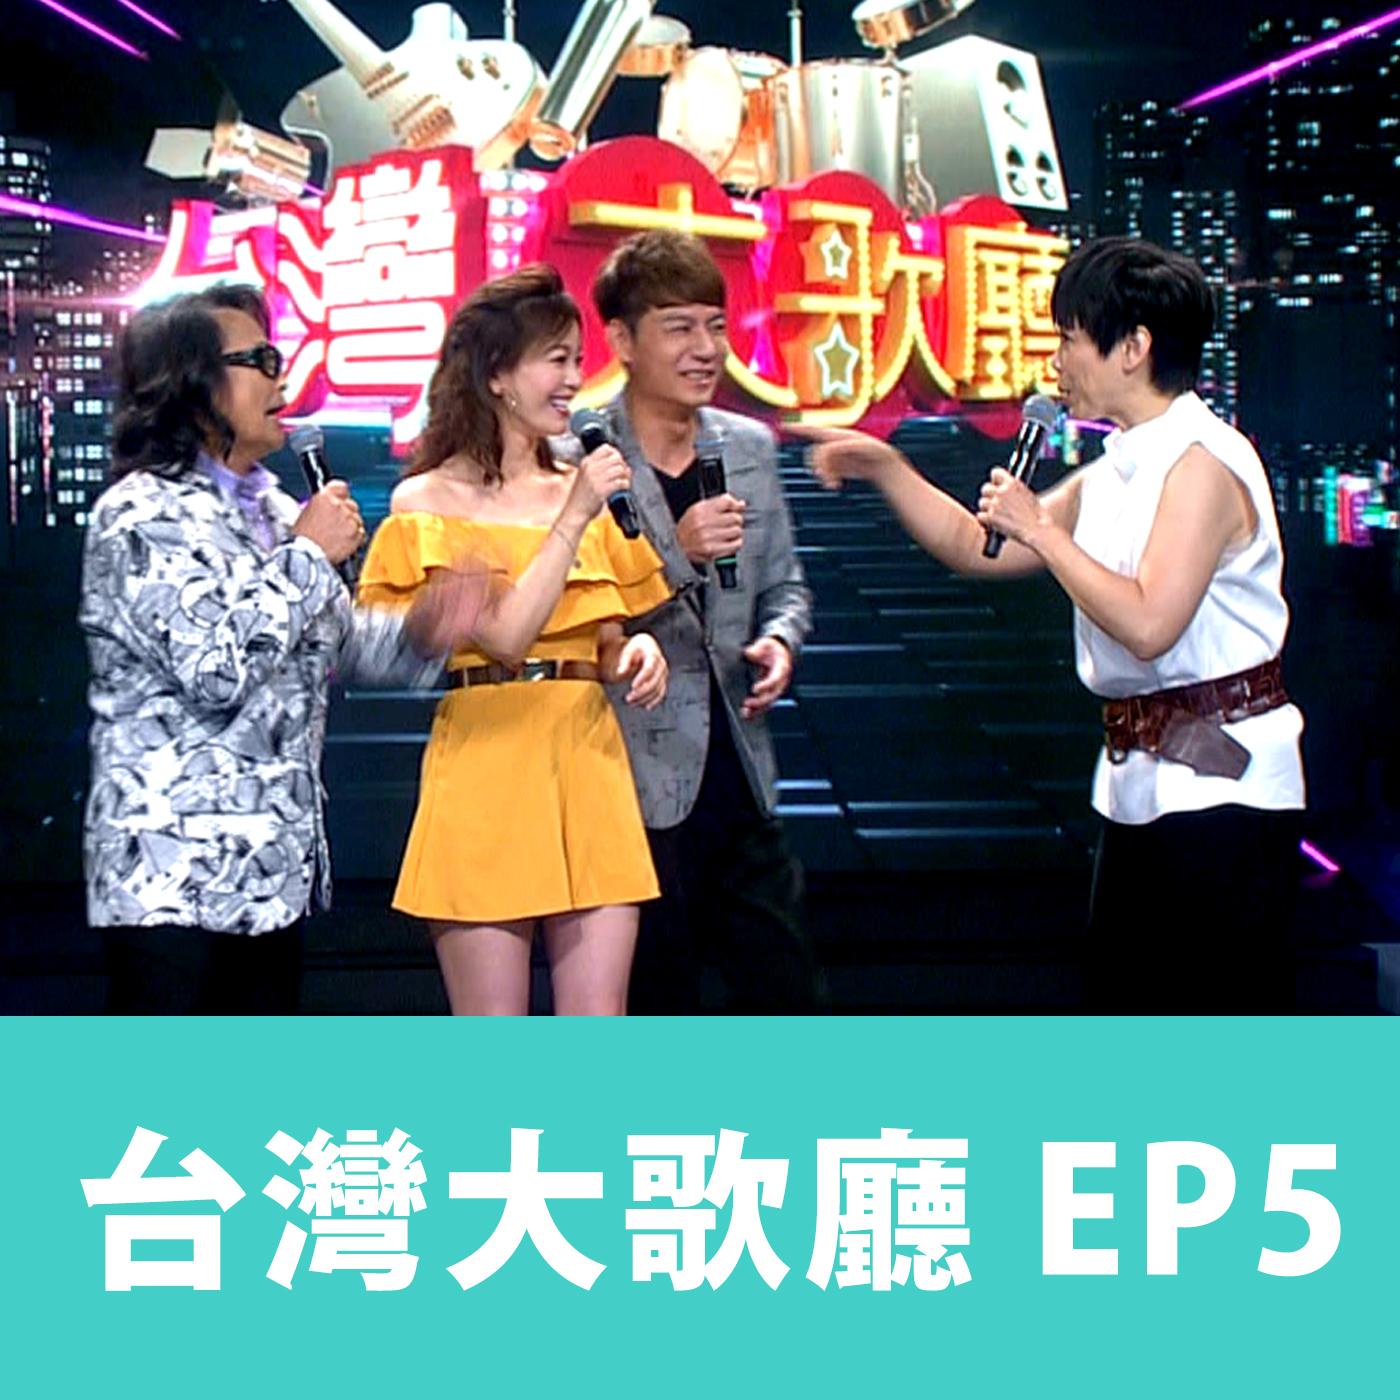 EP6 信吉衛視「台灣大歌廳」完整版_第五集